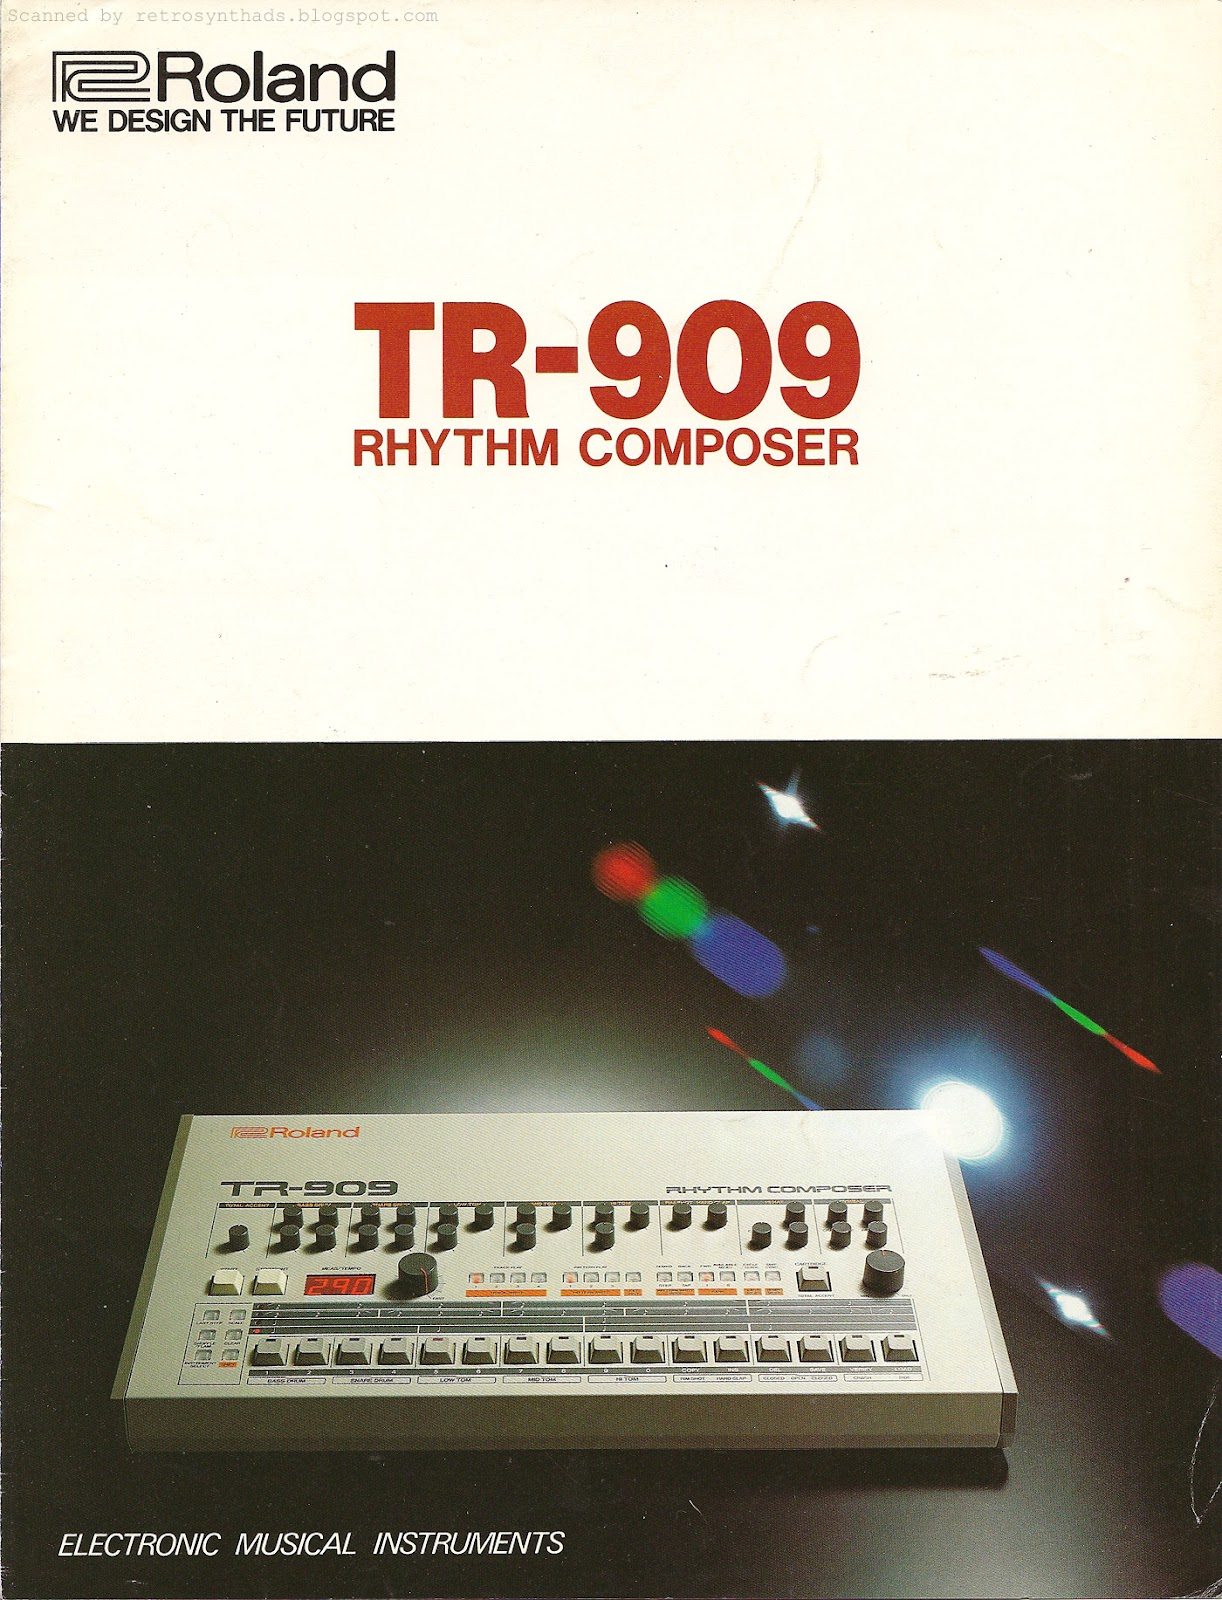 http://retrosynthads.blogspot.ca/2012/08/roland-tr-909-drum-machine-four-page.html